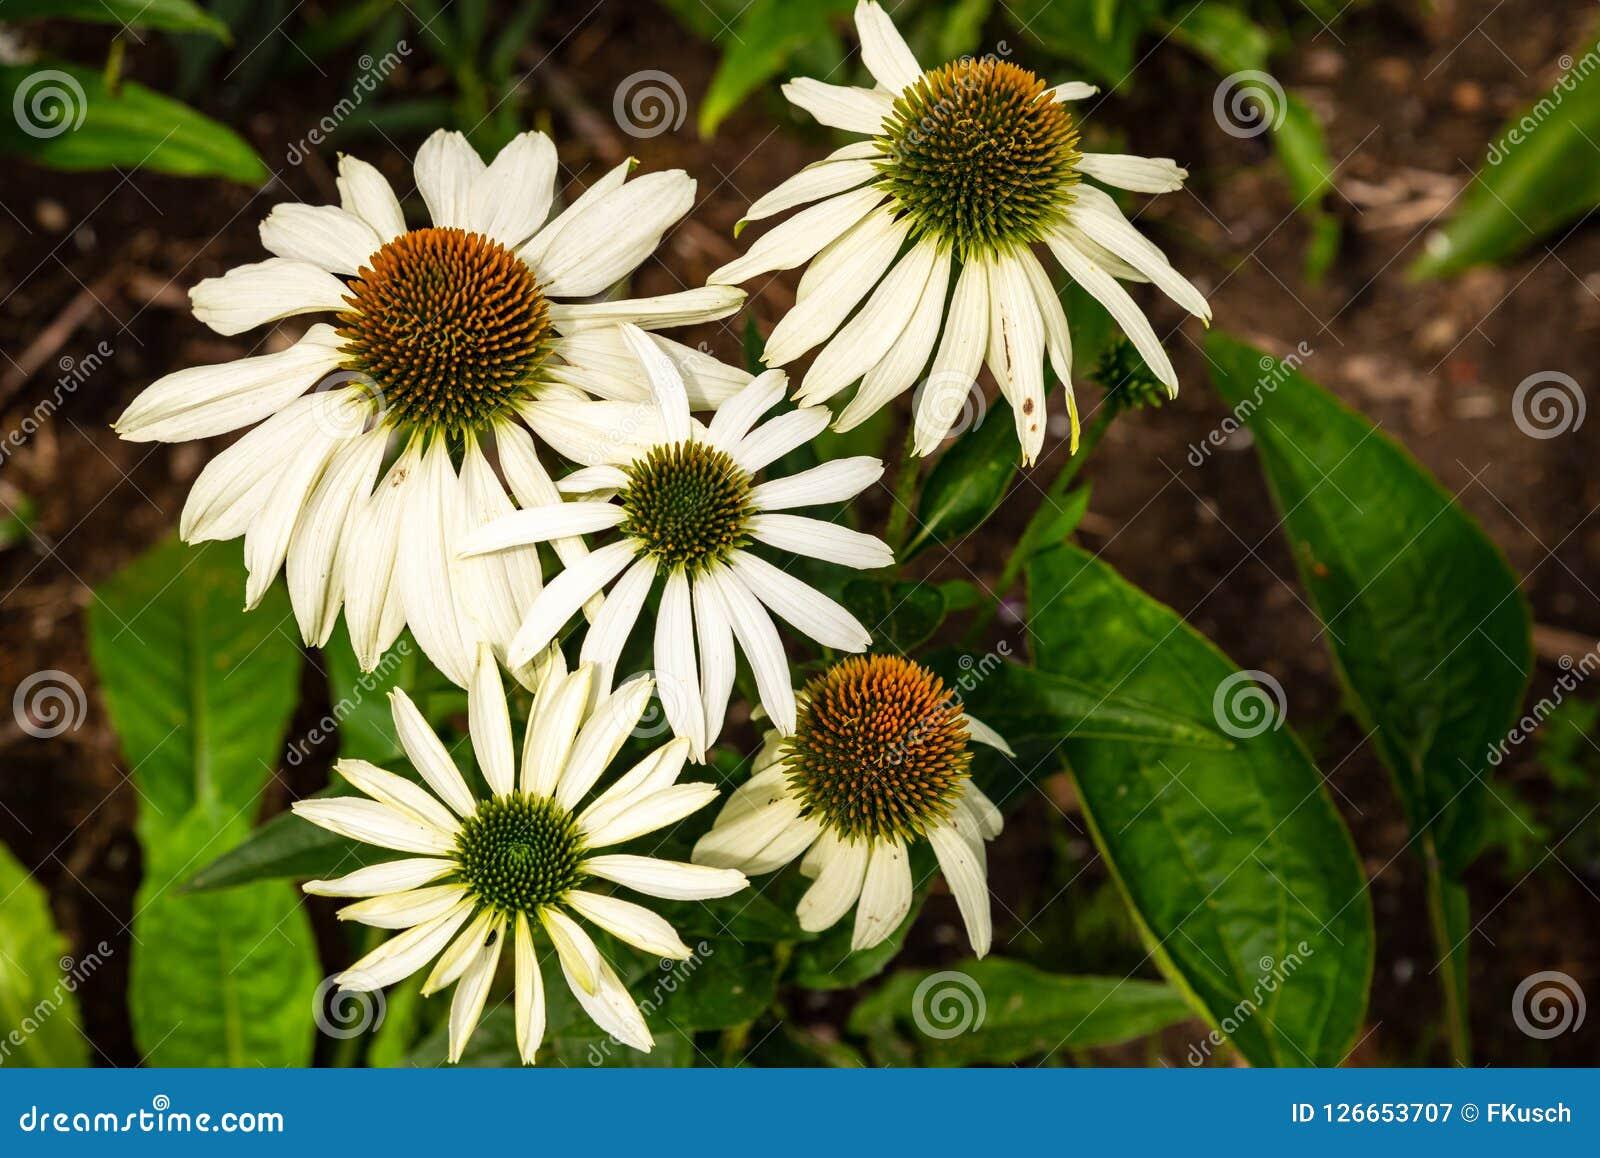 White Cone Flower Echinacea Purpurea Alba Stock Image Image Of